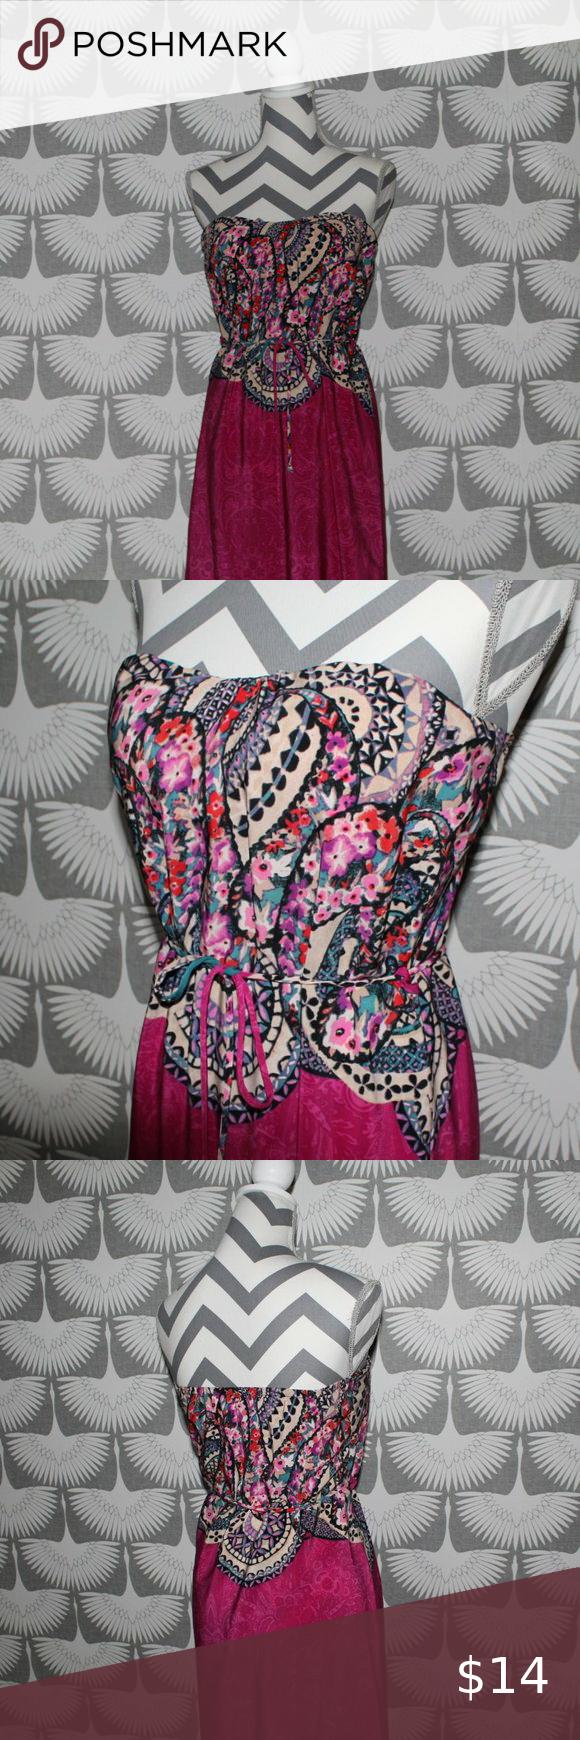 Strapless Boho Maxi Dress S Built In Bra Summer Beautiful Summer Maxi Dress Windsor No Size Tag Is Attached Though Th Boho Maxi Dress Boho Maxi Maxi Dress [ 1740 x 580 Pixel ]